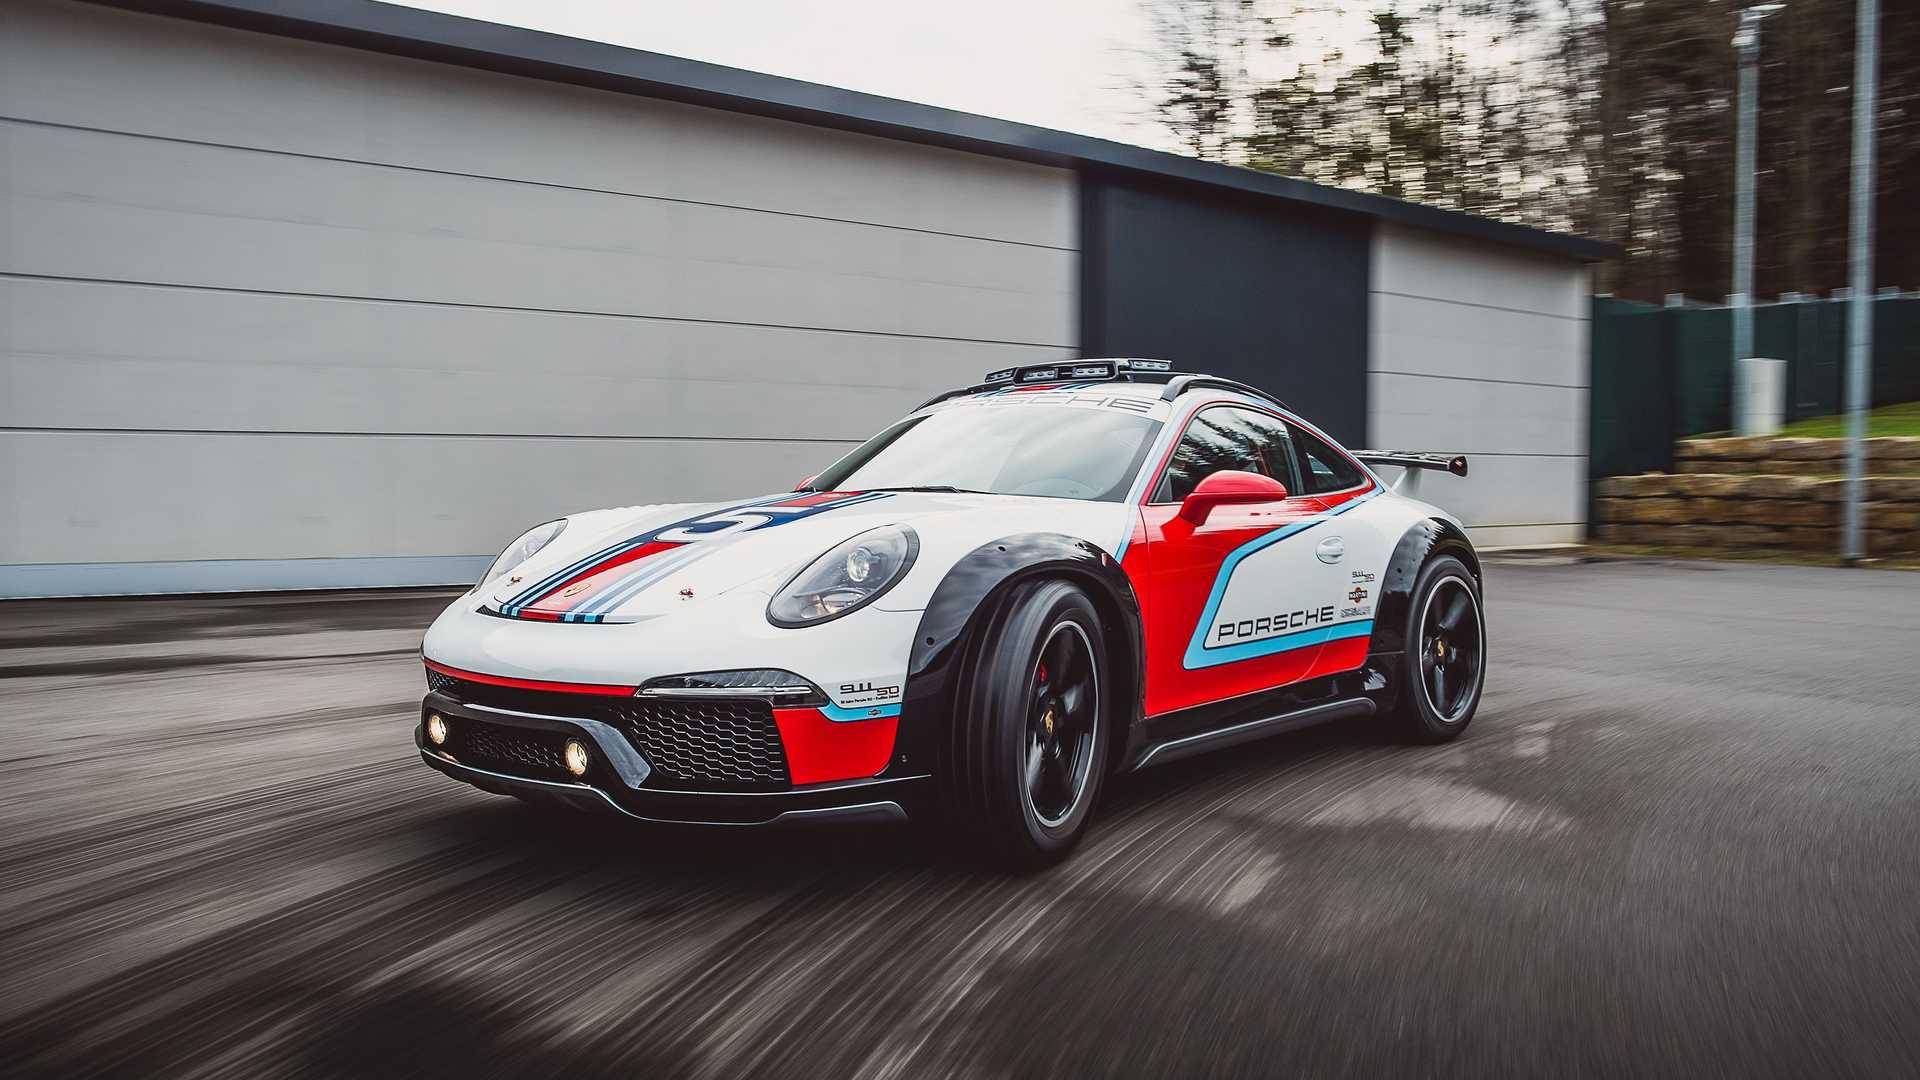 Porsche-911-Vision-Safari-2